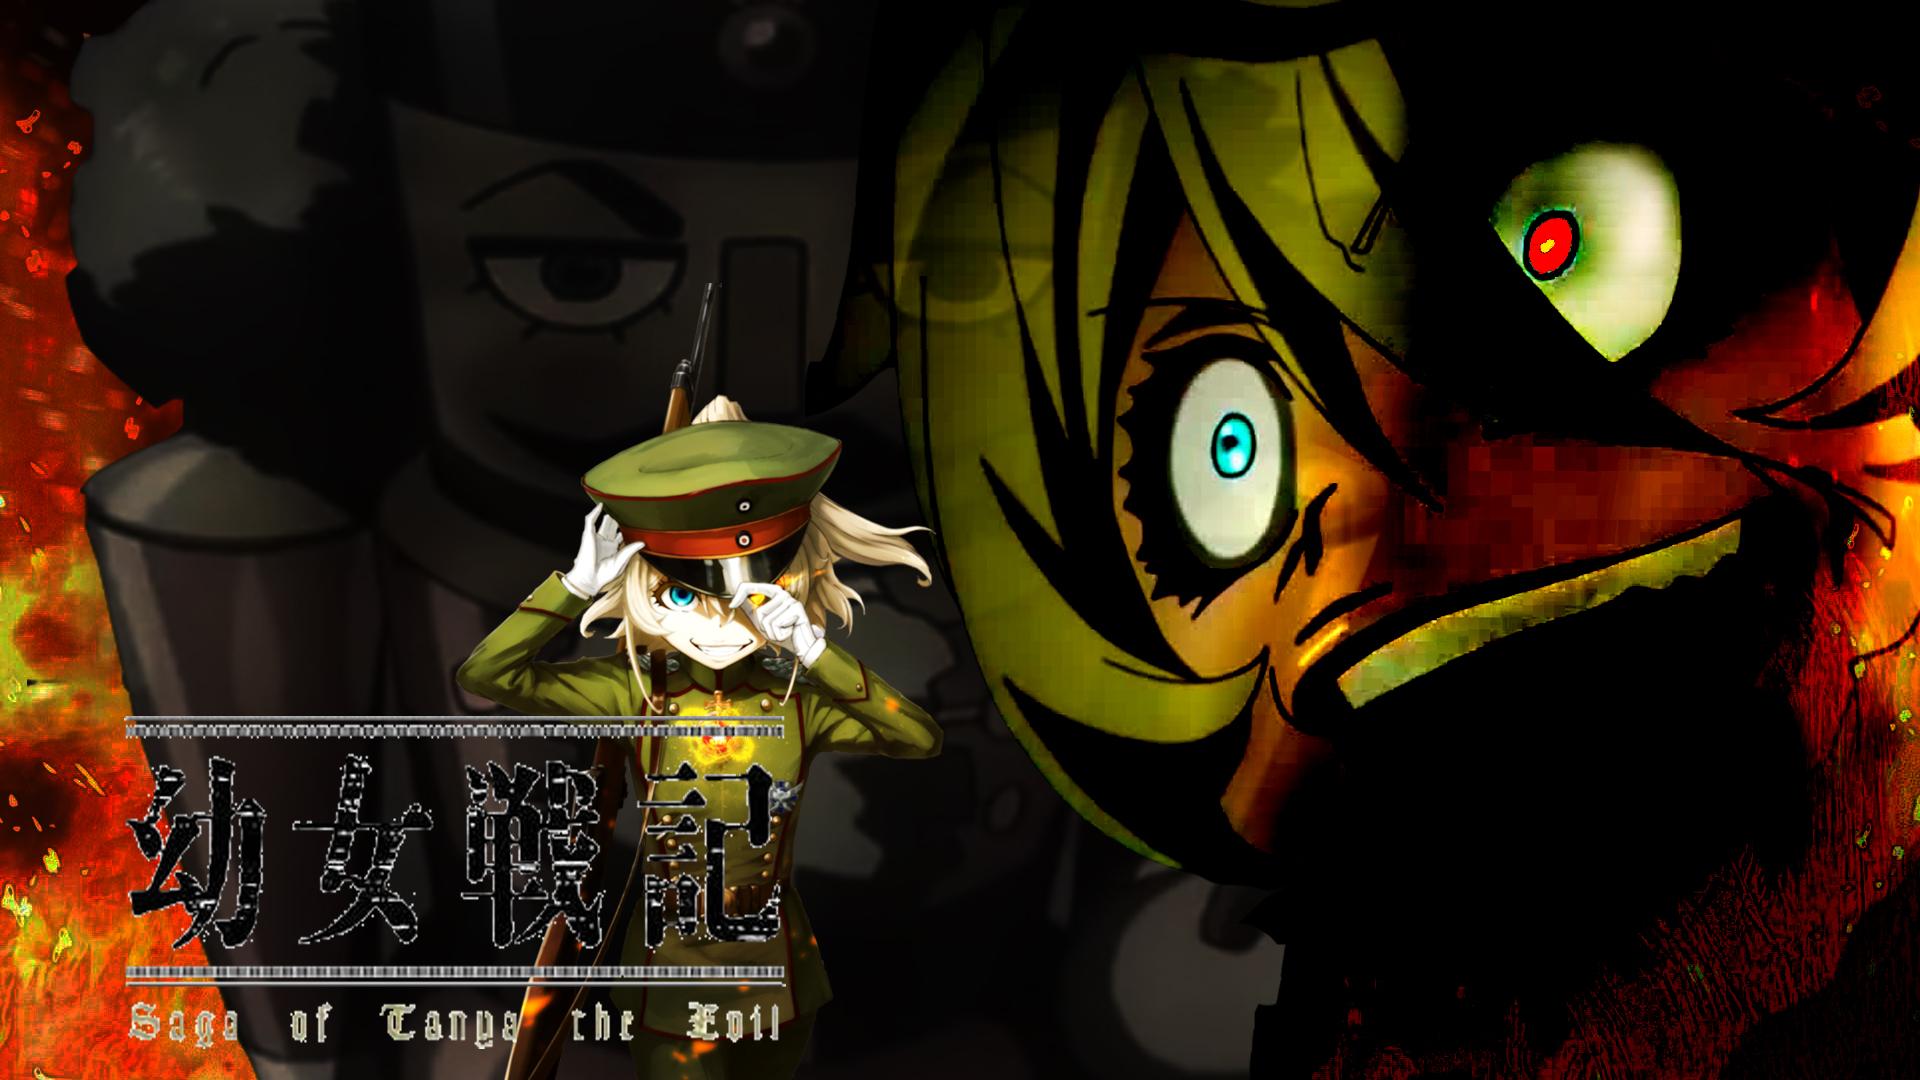 Saga Of Tanya The Evil Wallpaper By Avrilwawe48 On Deviantart